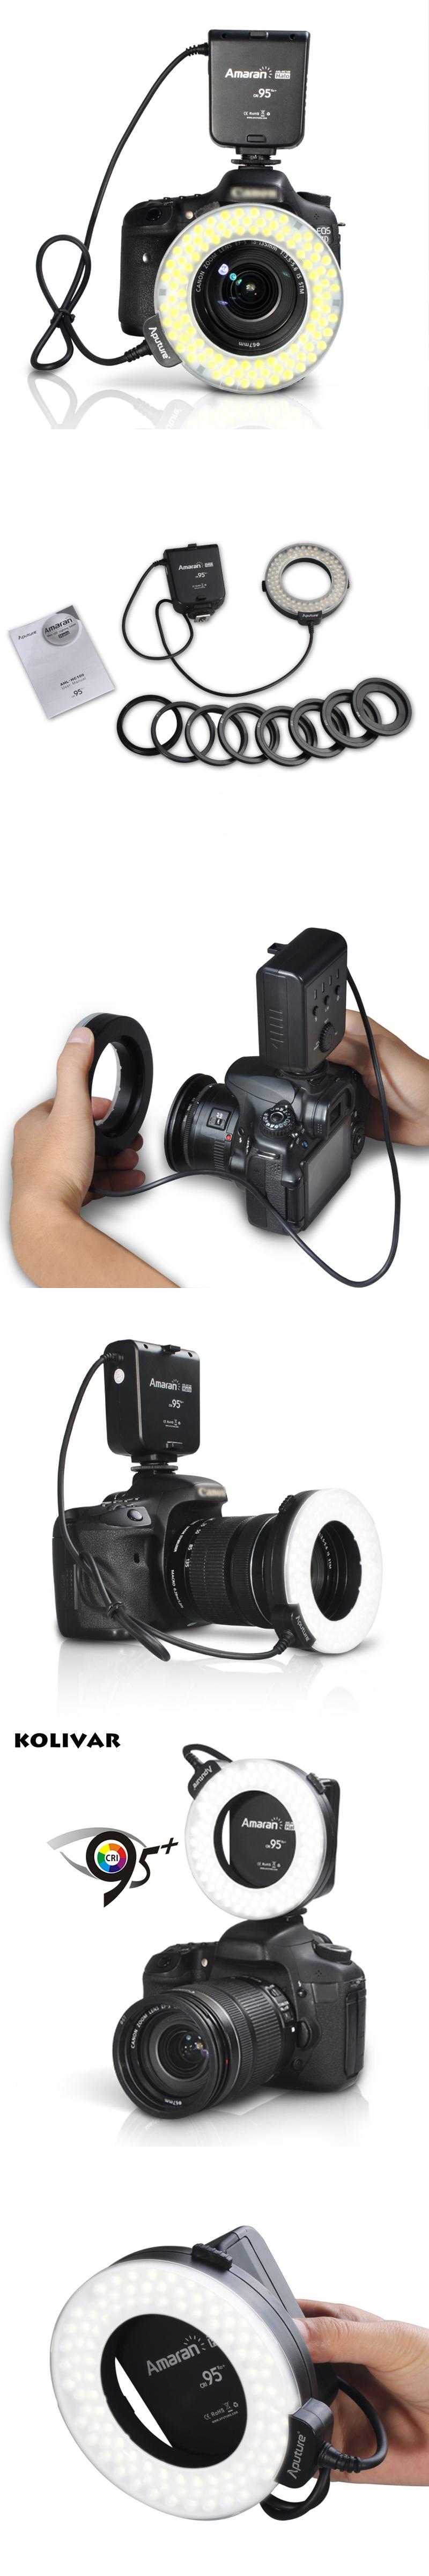 Aputure Halo HC100 LED Marco Ring Light Video Flash Light For Canon ...